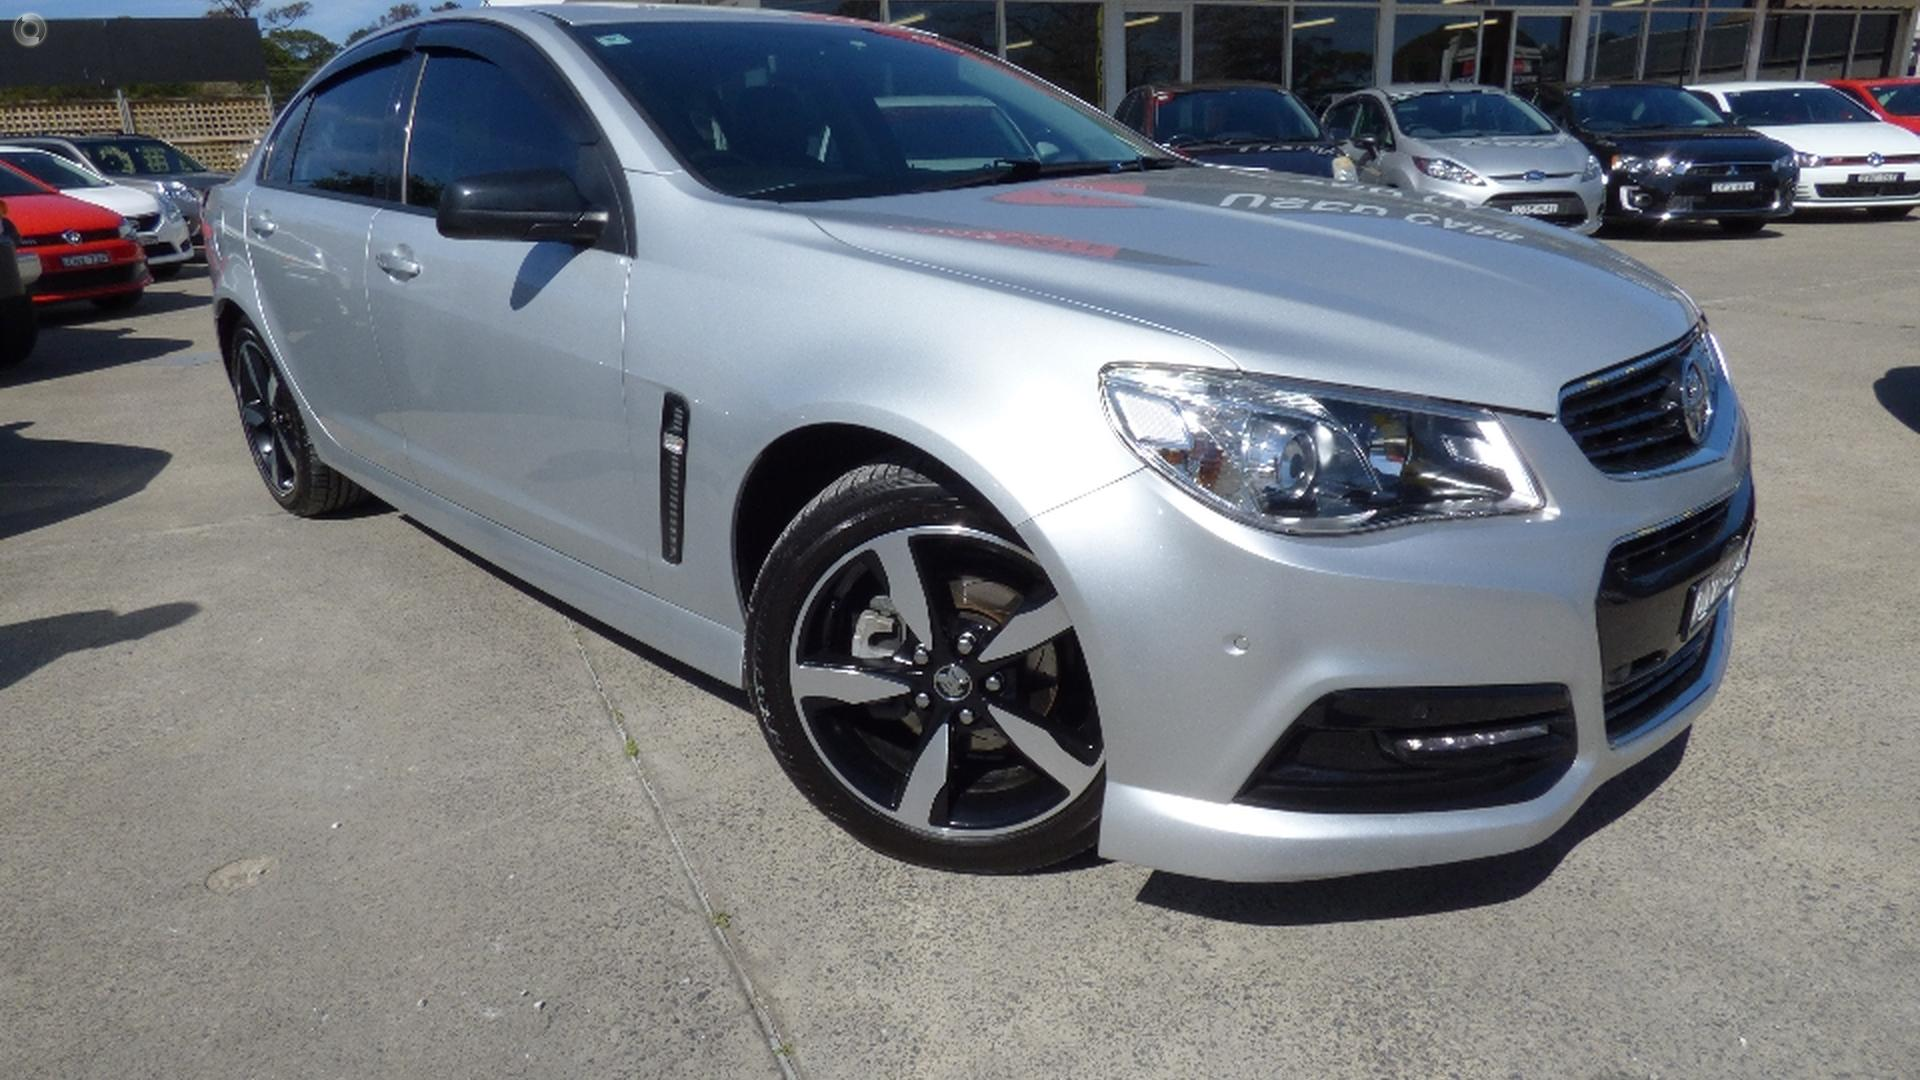 2013 Holden Commodore Sv6